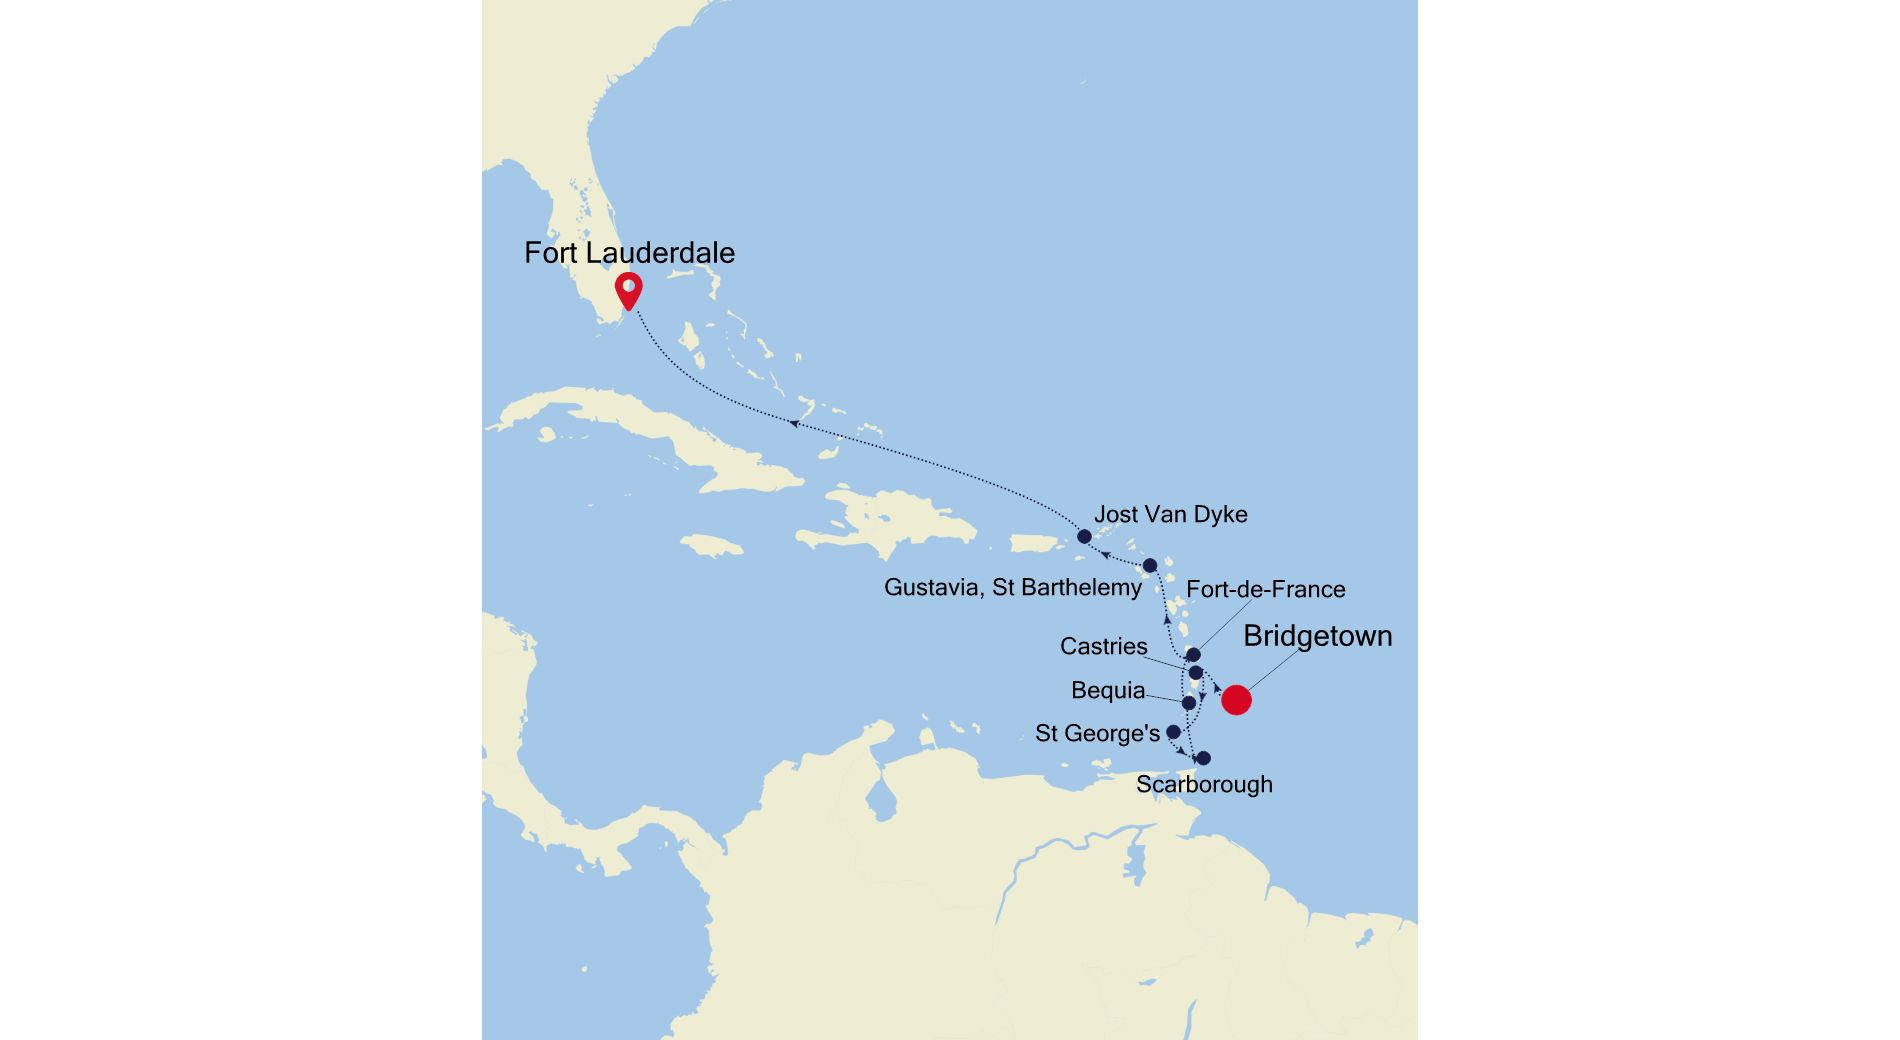 2013 - Bridgetown to Fort Lauderdale